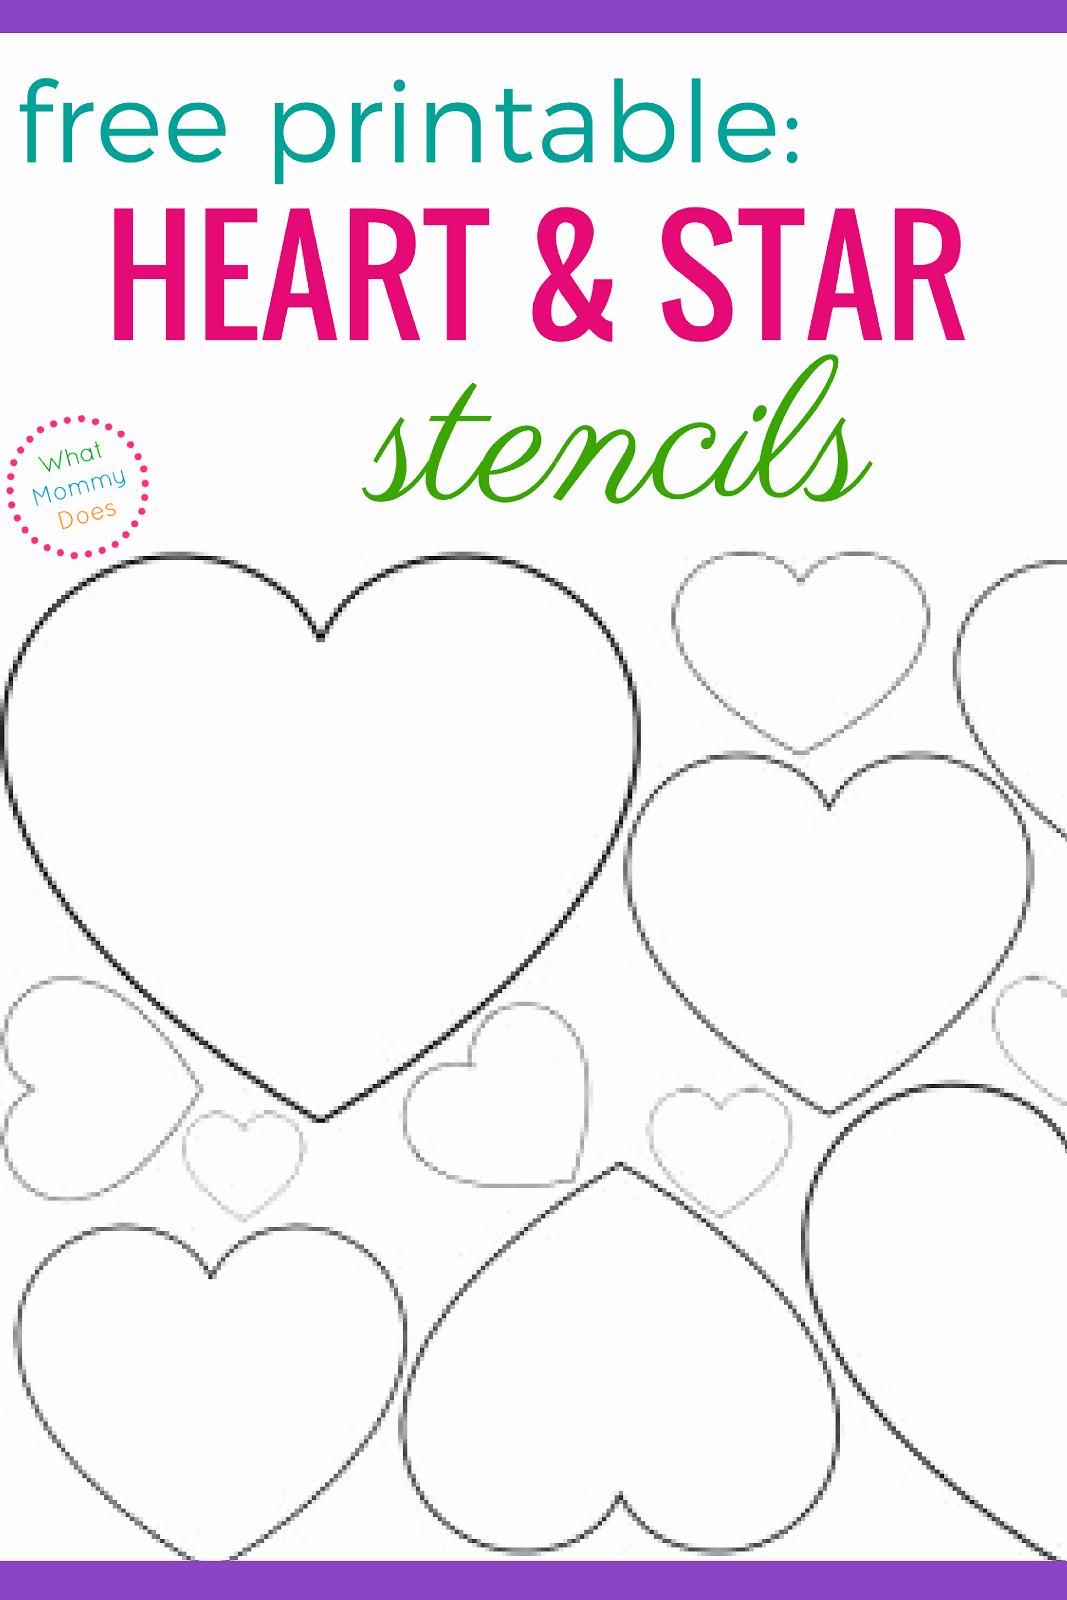 Stars Stencil Printable Inspirational Free Printable Heart Stencils & Star Templates